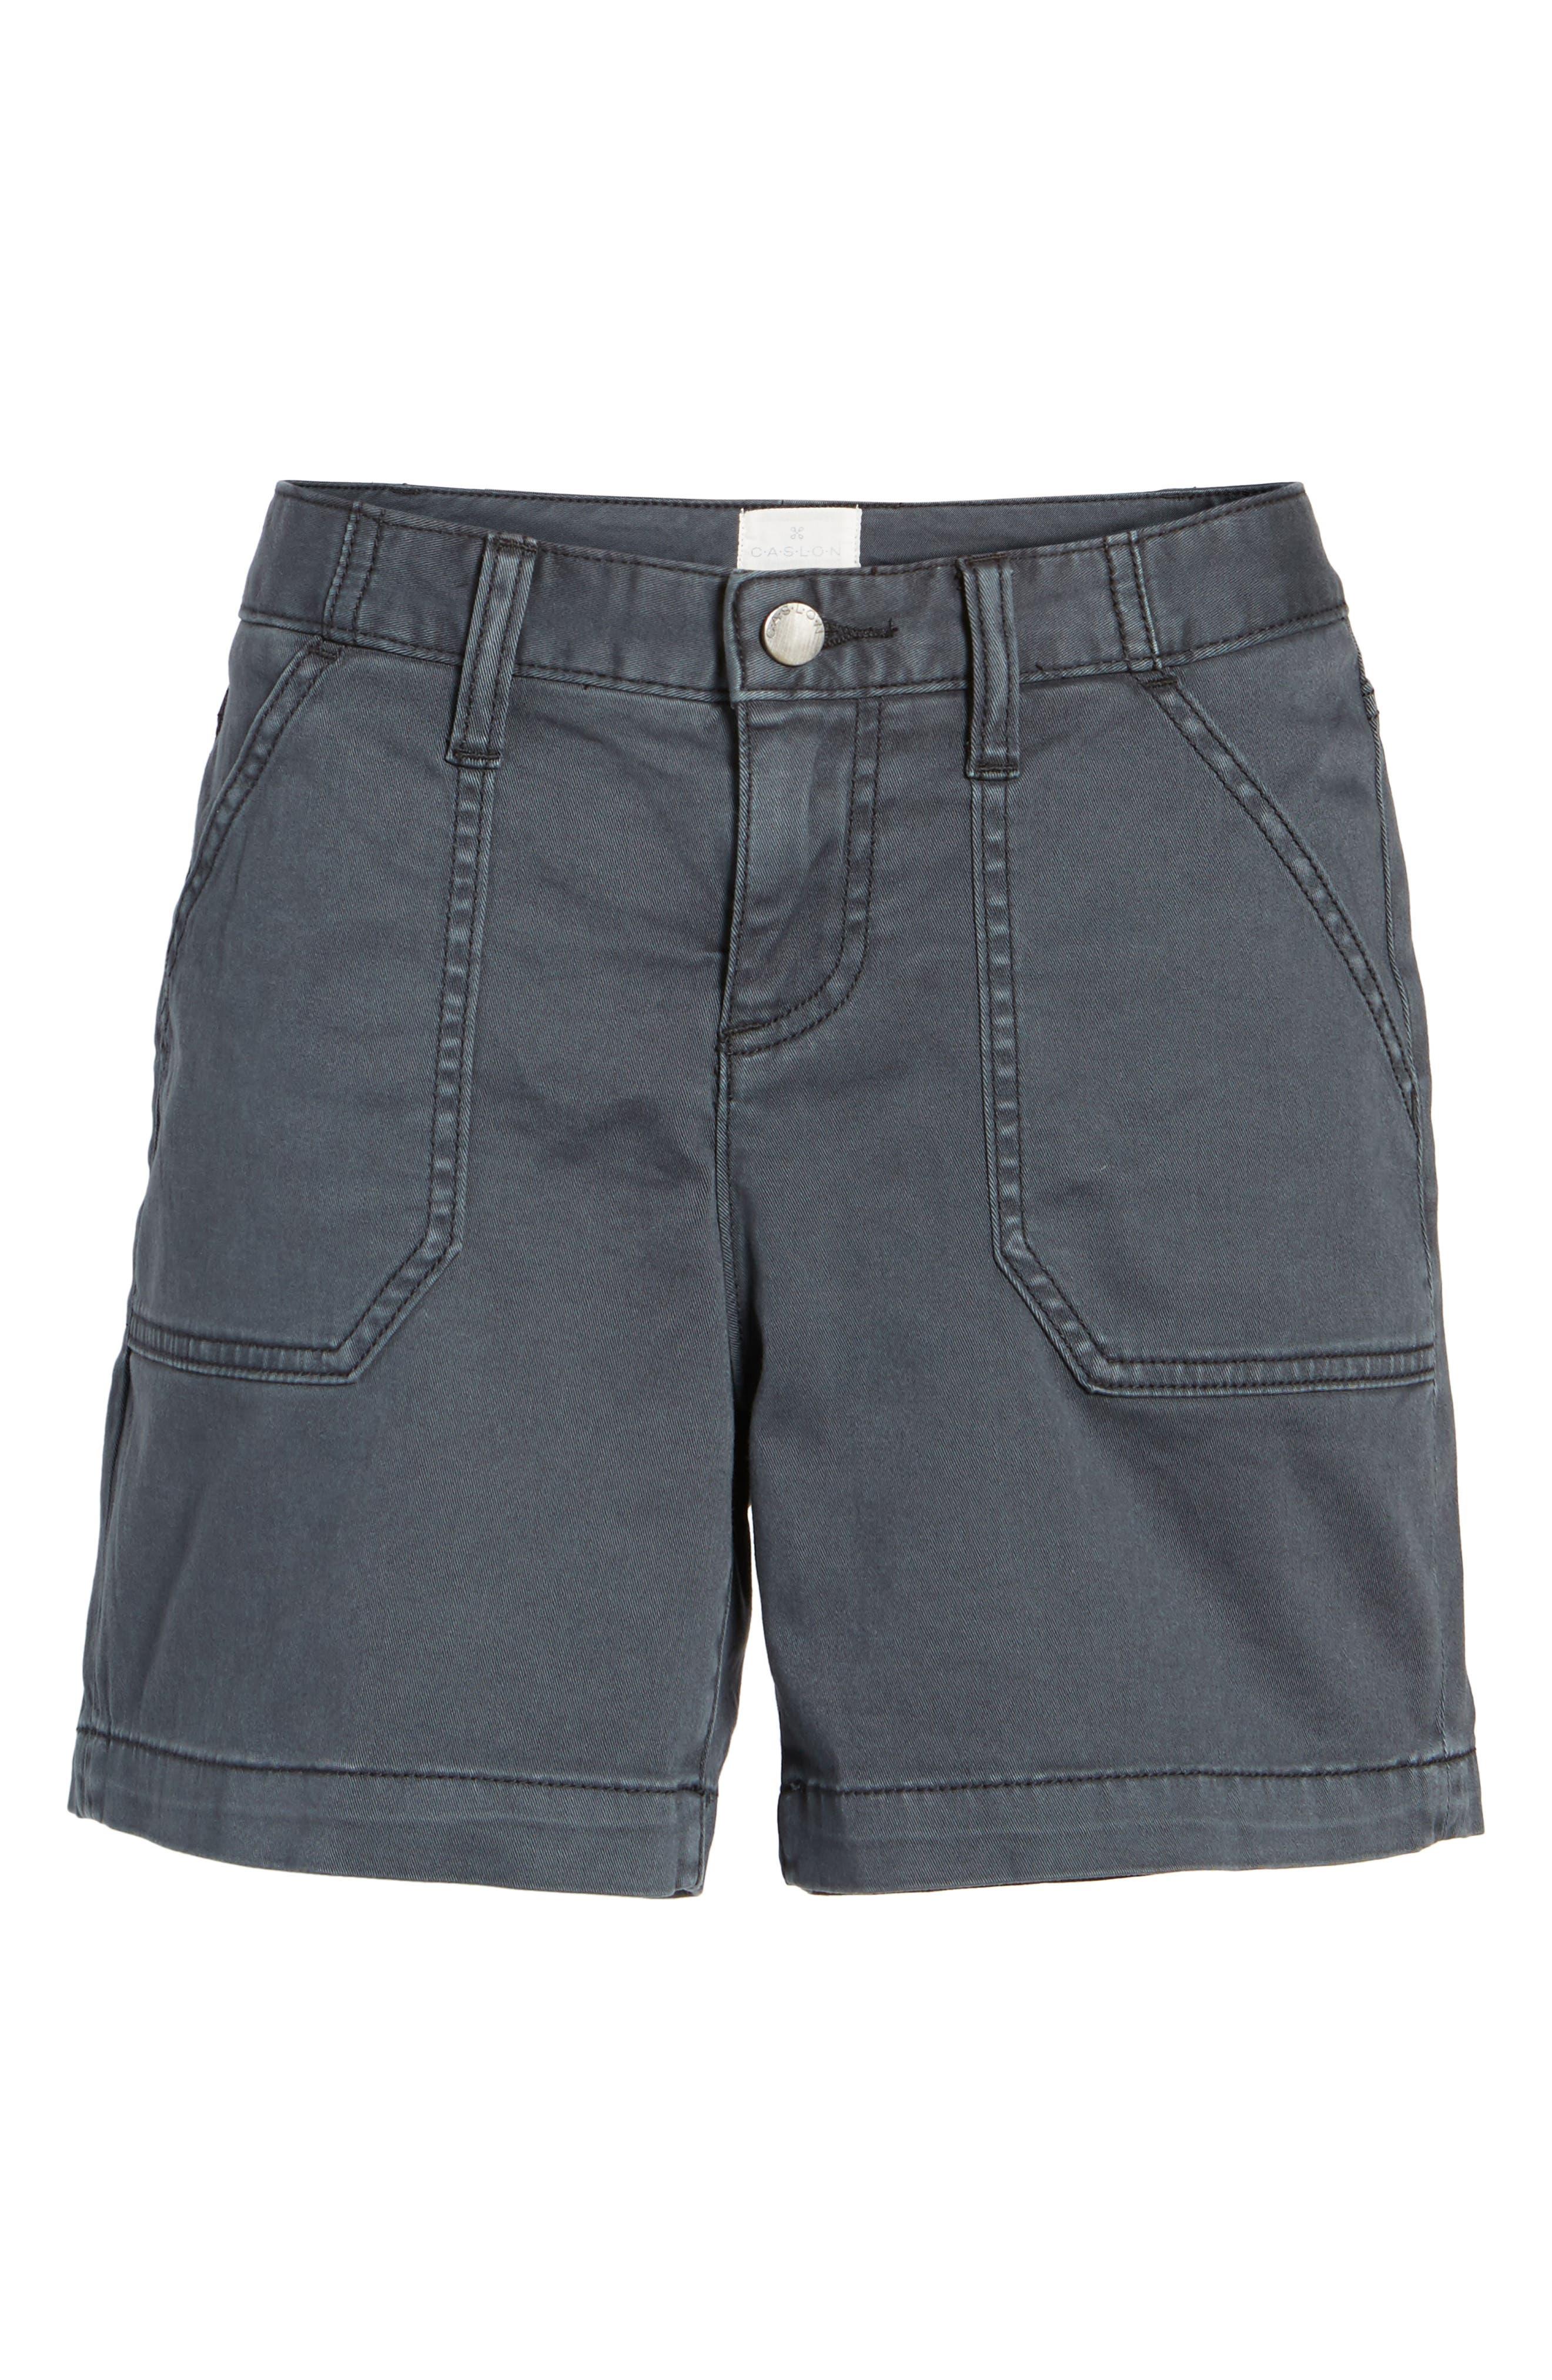 Utility Shorts,                             Alternate thumbnail 33, color,